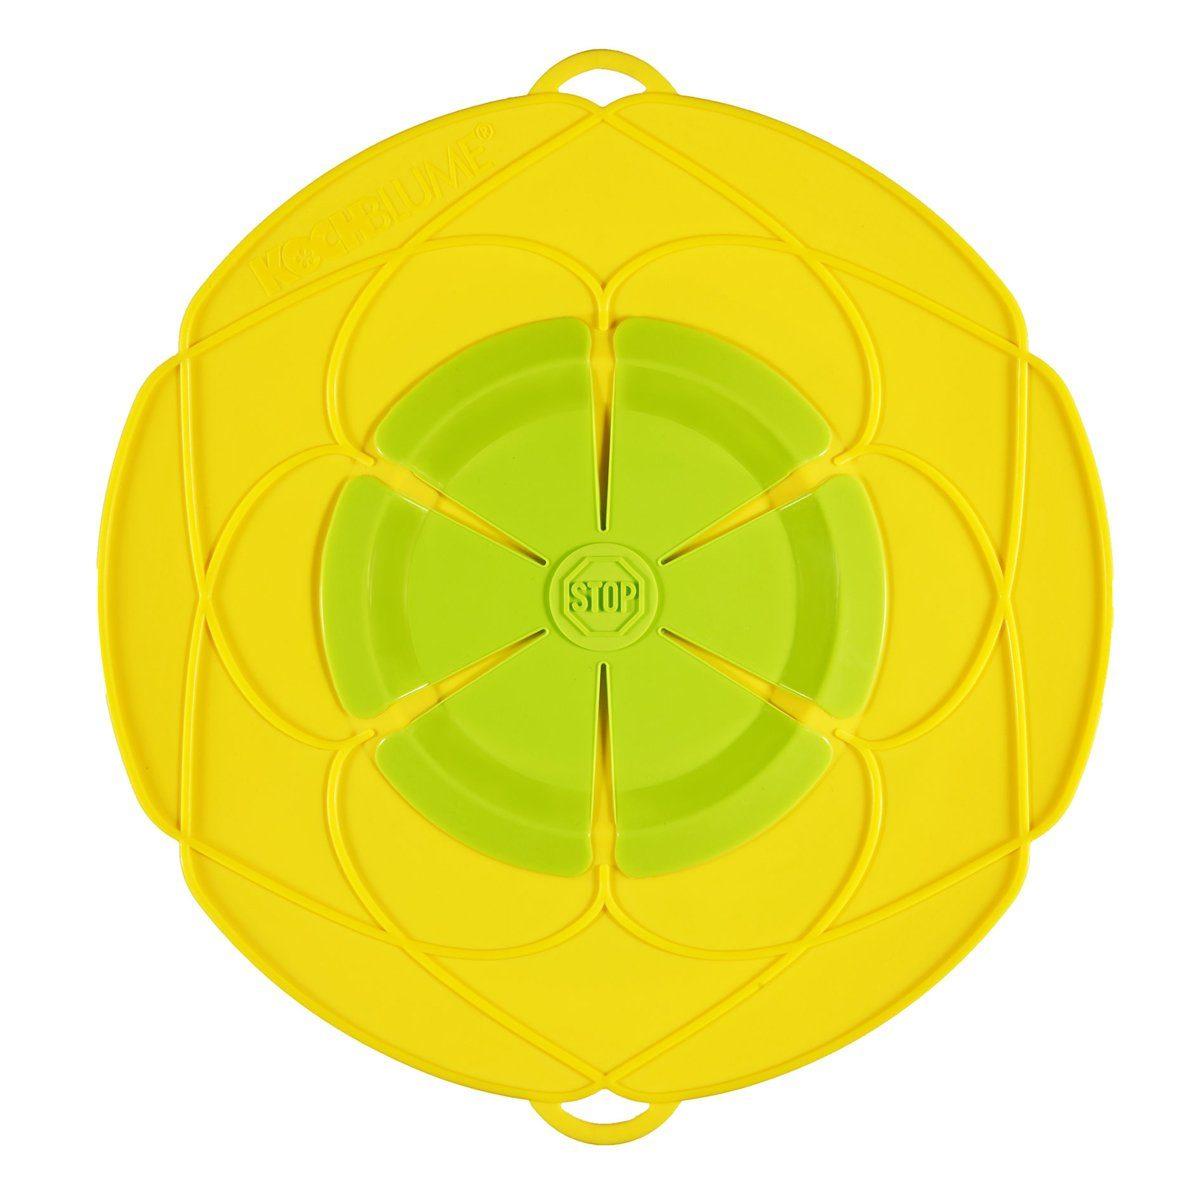 Kochblume Kochblume Überkochschutz gelb 25.5 cm